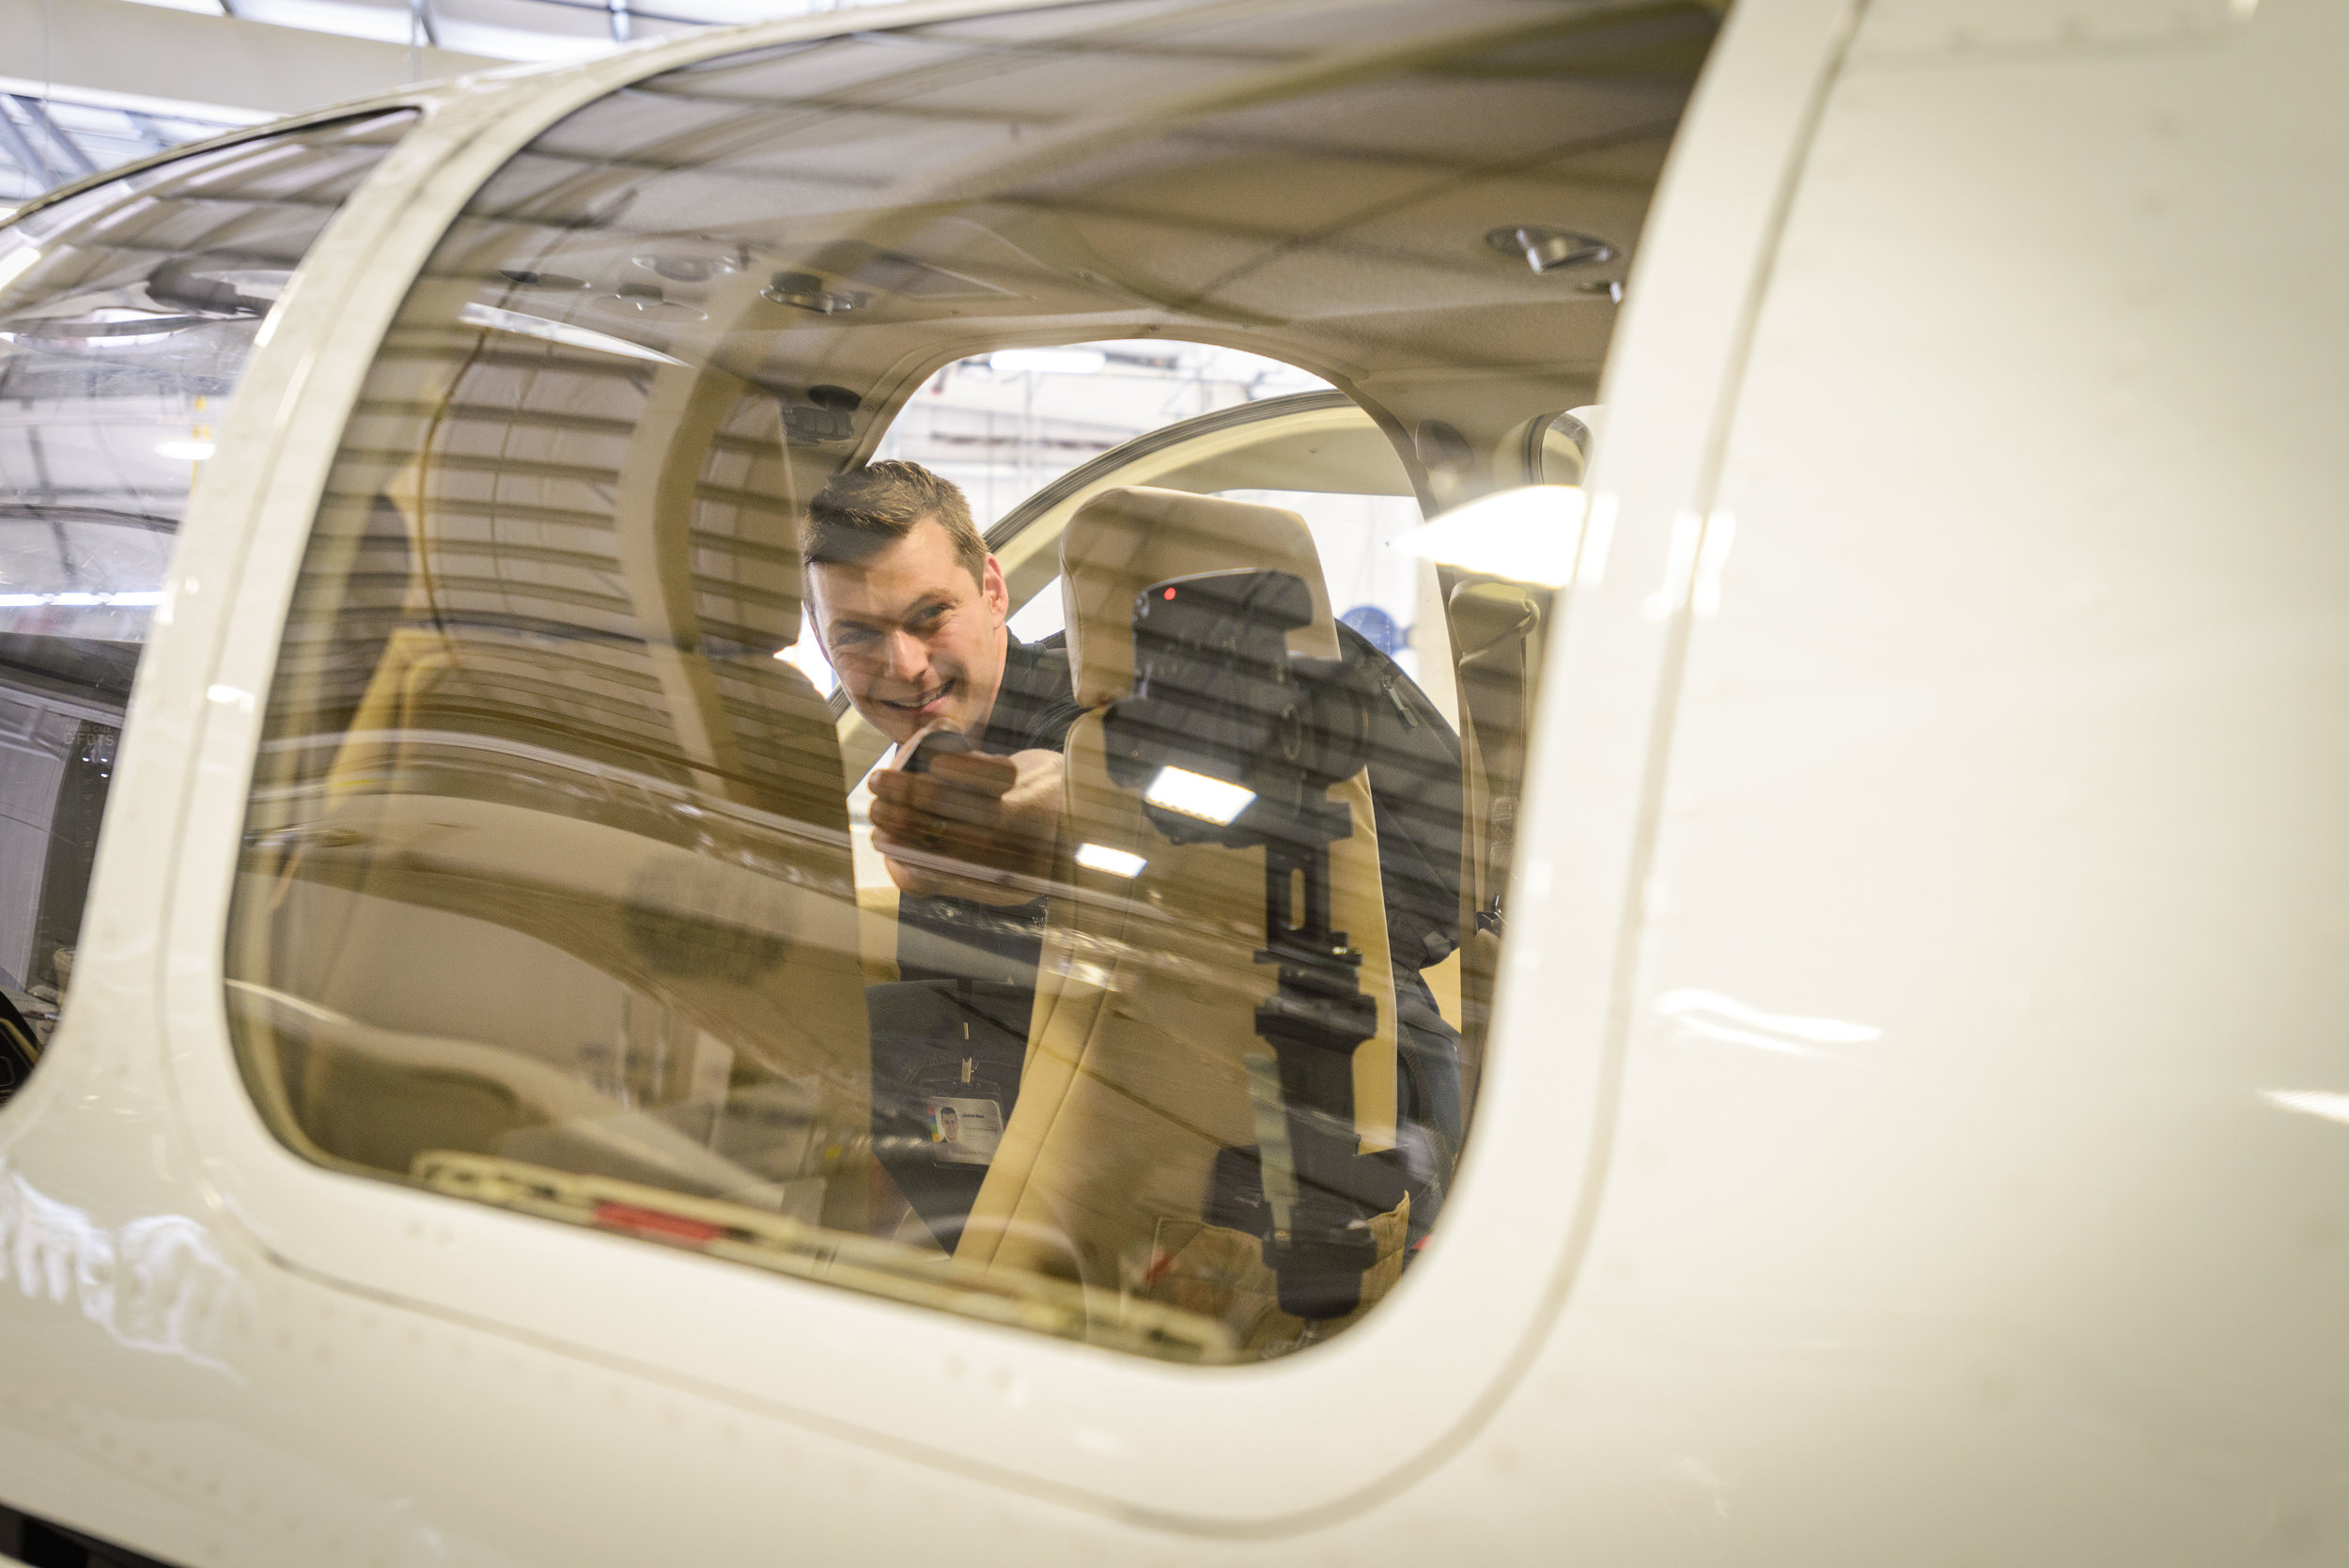 Capturing a 360° shot inside a Beechcraft Baron at Seneca's Aviation Campus in Peterborough